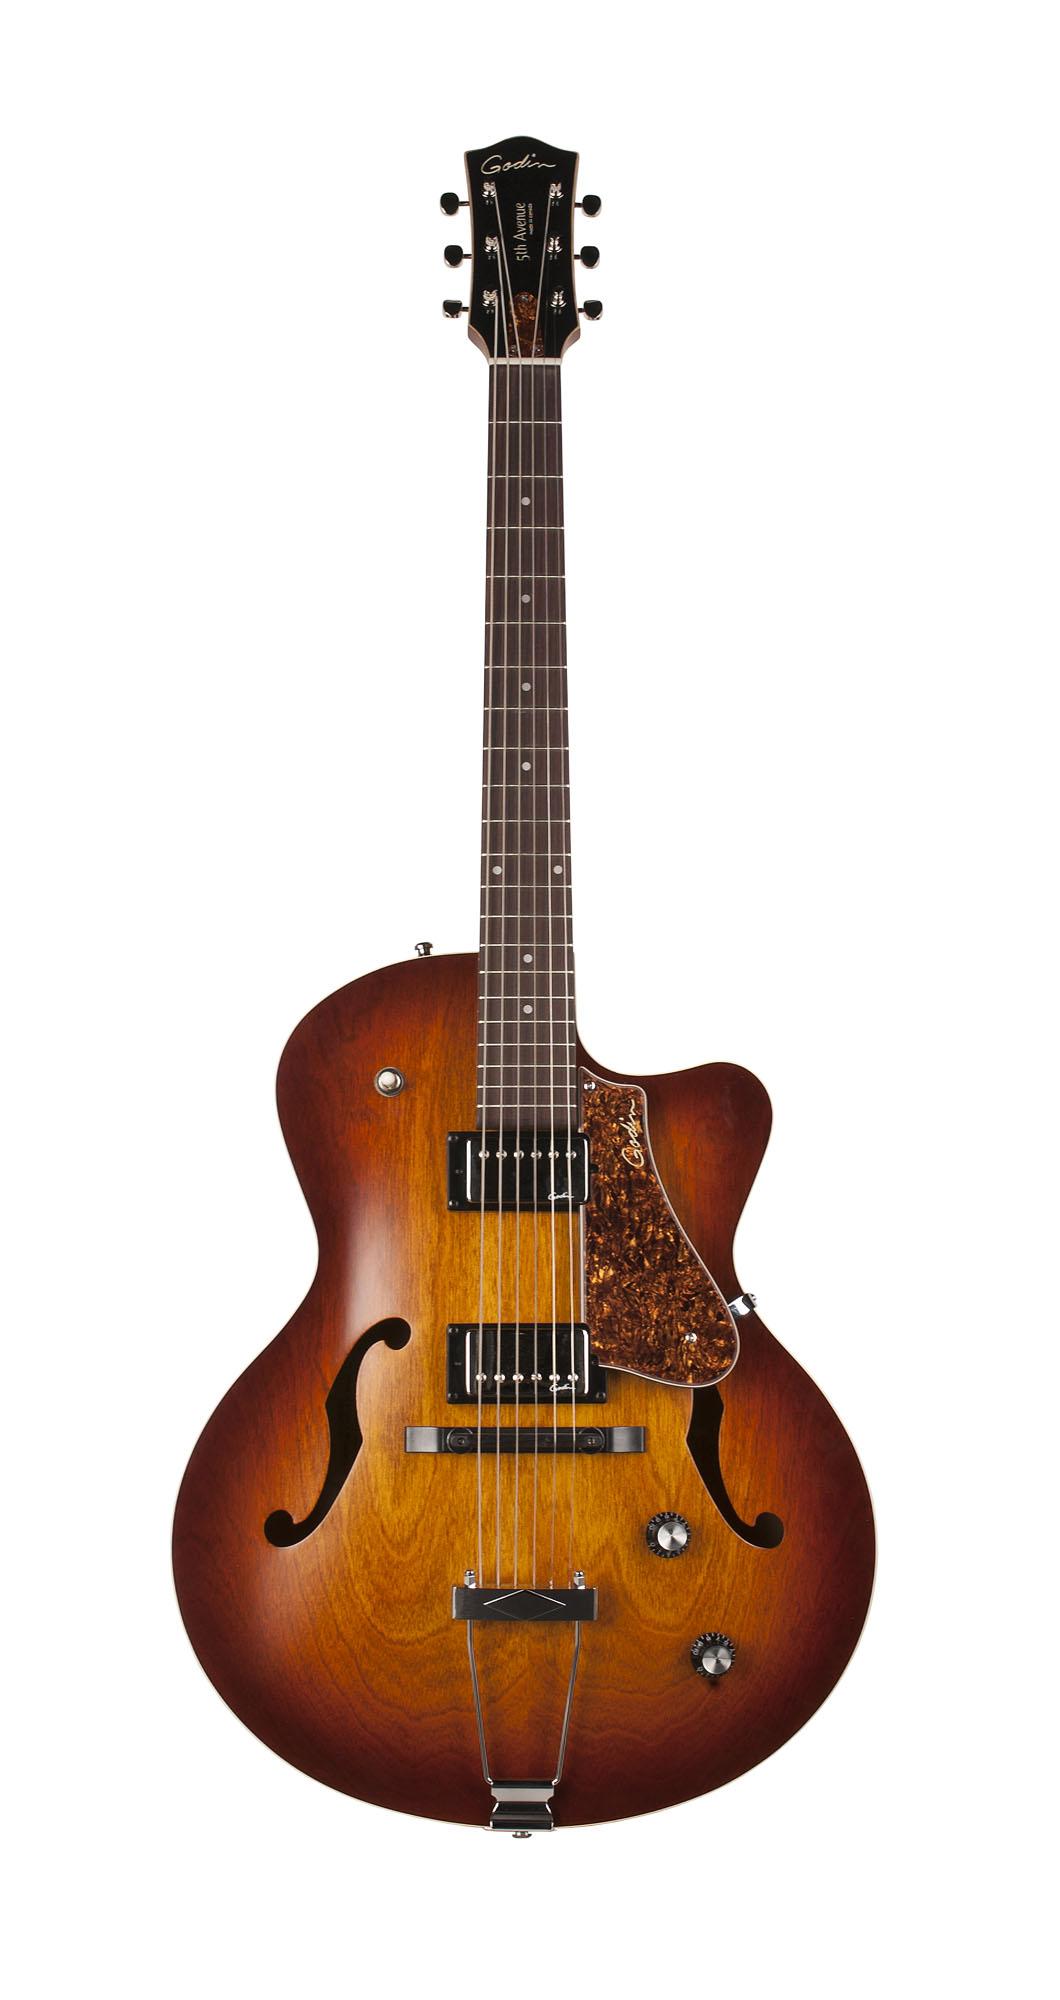 Godin 39289 5th Avenue CW HB Cognac Burst Archtop Semi-Hollow Electric Guitar